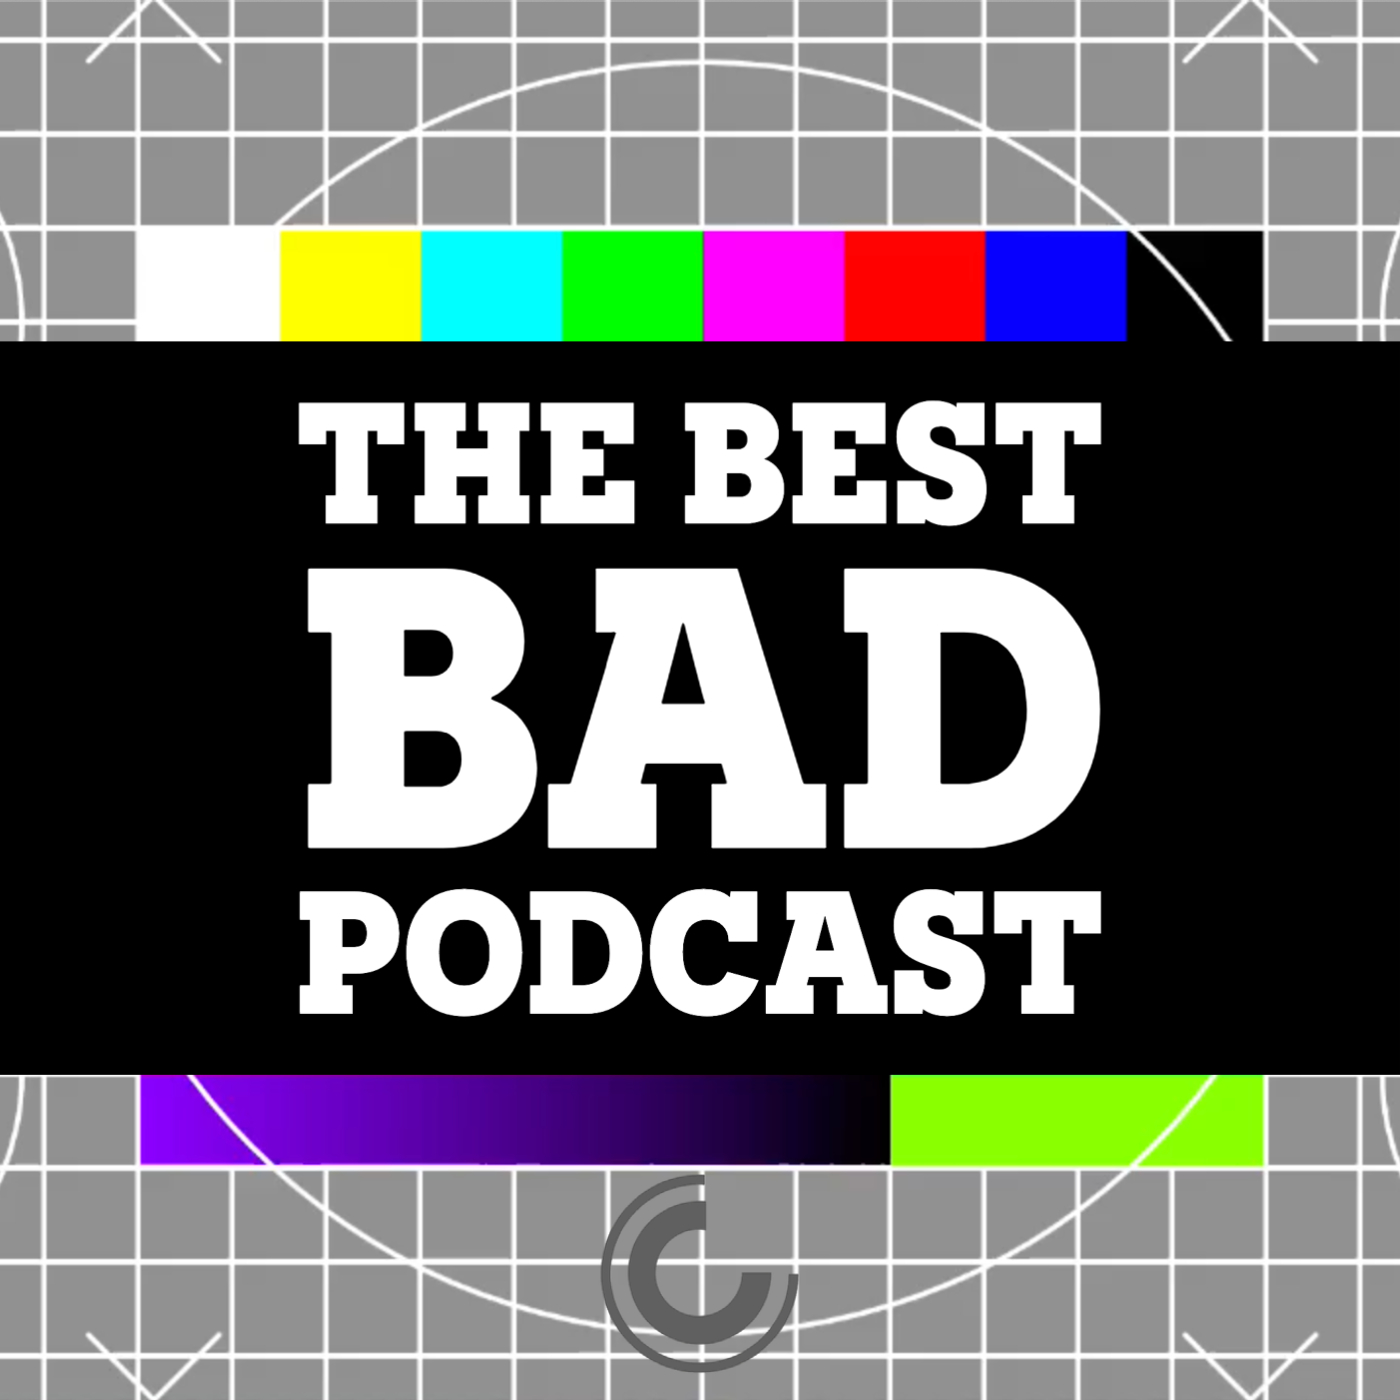 Artwork for podcast The Best Bad Podcast